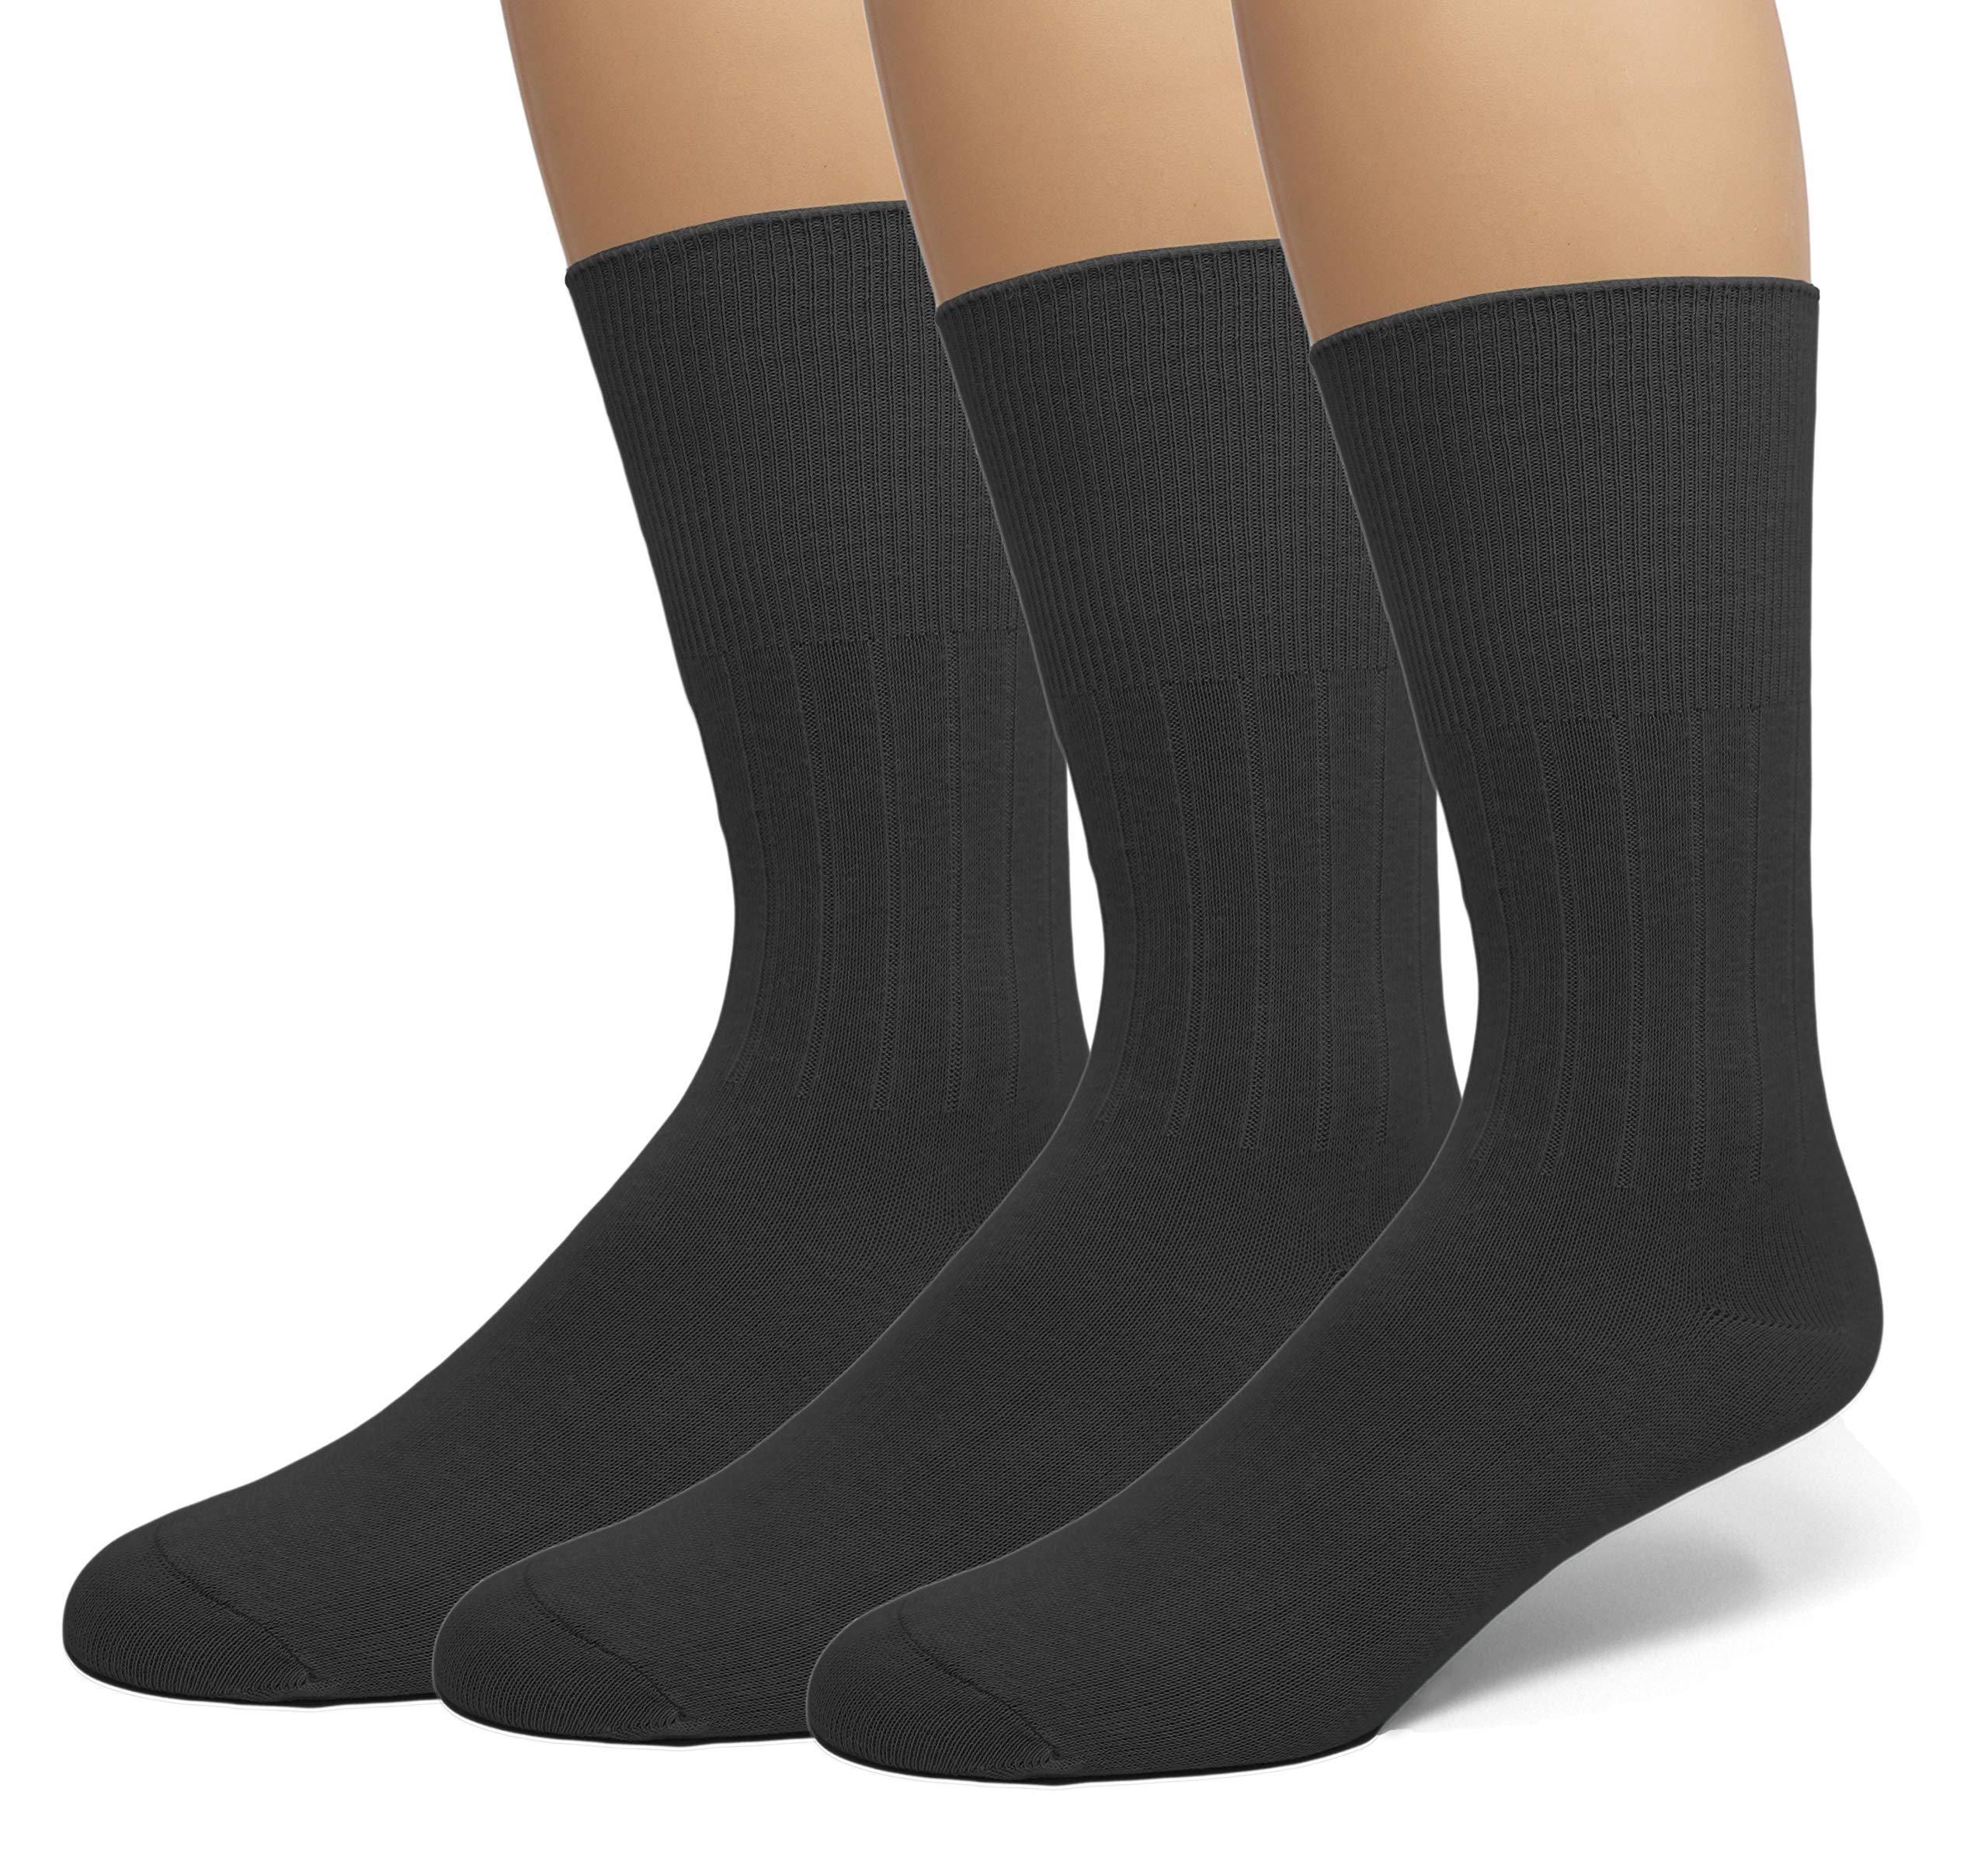 658645c804 EMEM Apparel Men's Diabetic Dress Crew Cotton Socks | Non-Binding Loose Top  | Seamless